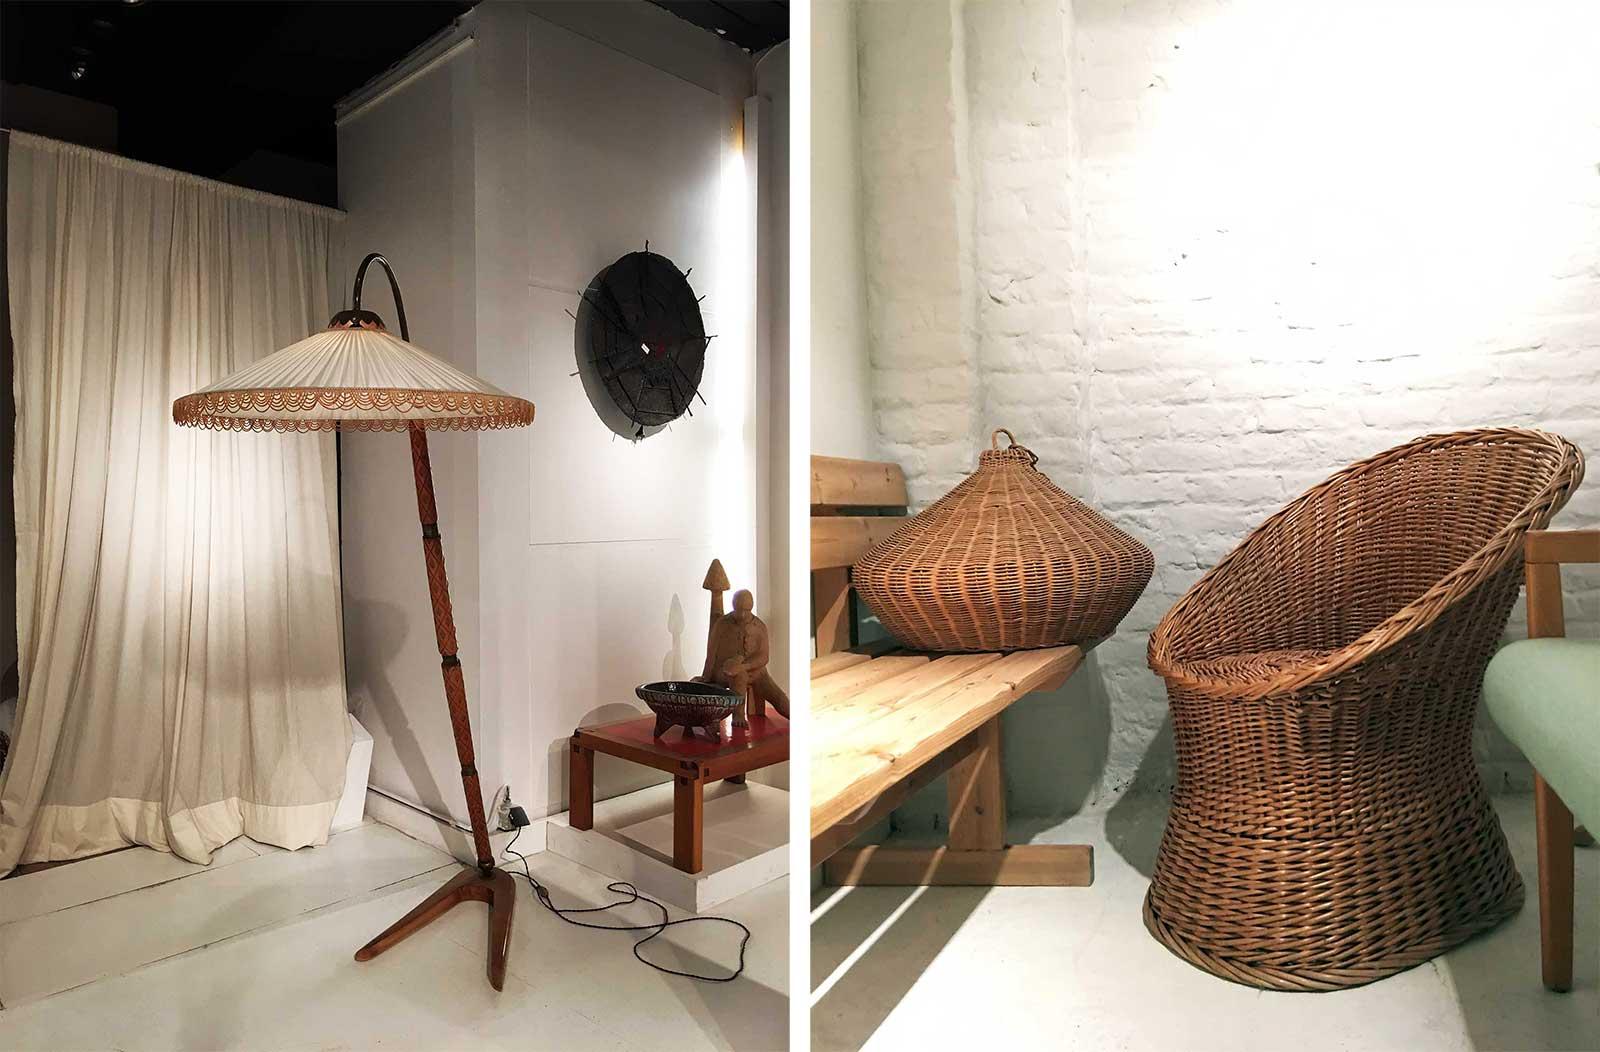 Chiner bruxelles misc webzine for 207 haute antiques